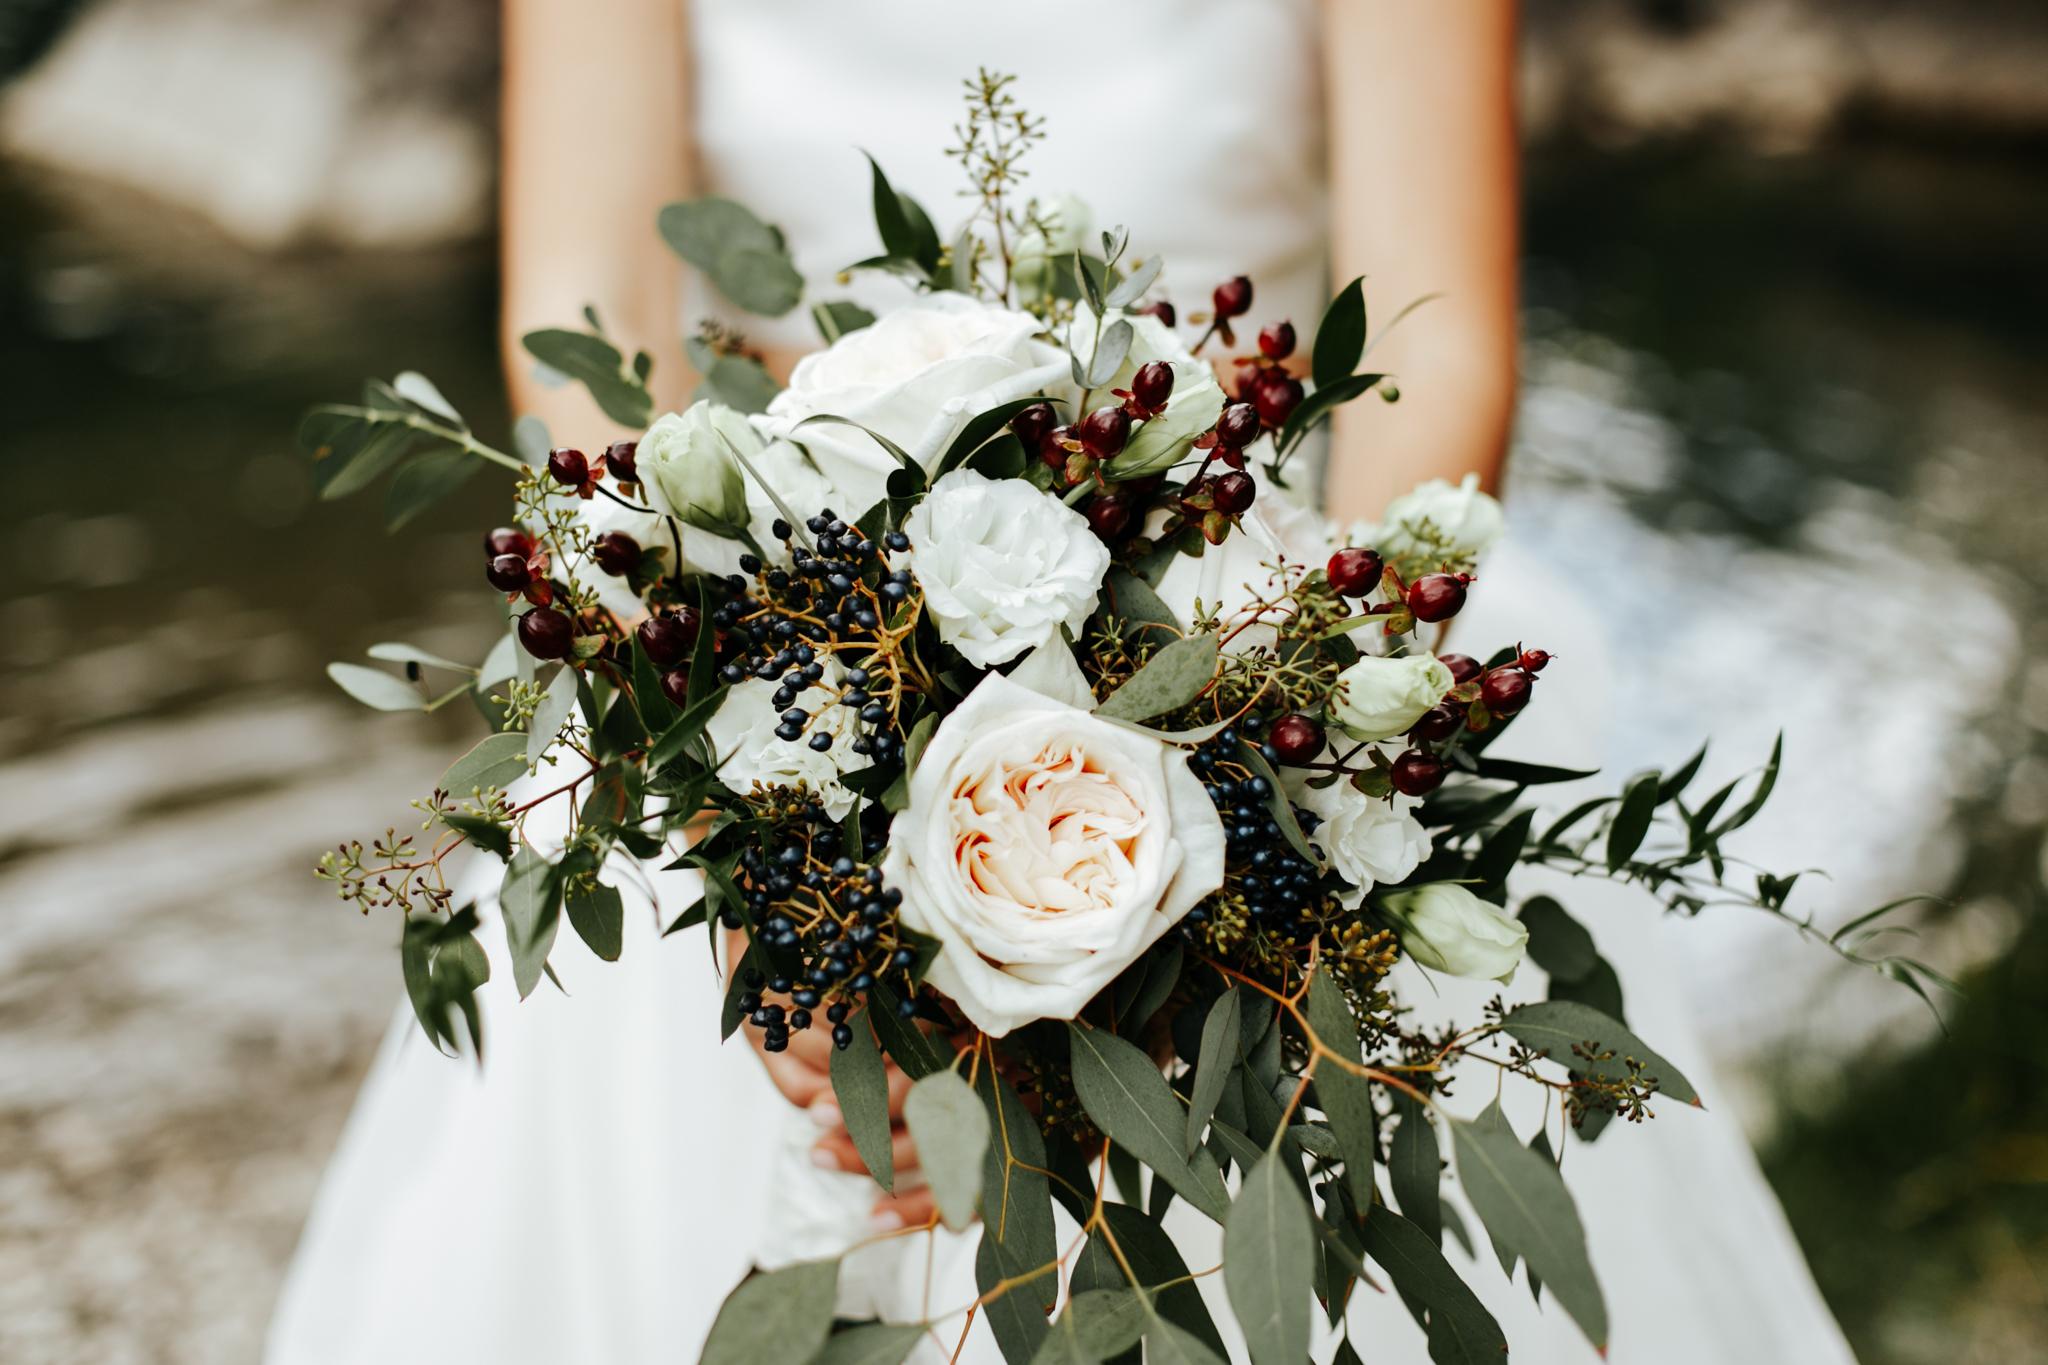 lethbridge-wedding-photographer-love-and-be-loved-photography-kurtis-beth-springbreak-flower-farm-crowsnest-pass-mountain-picture-image-photo-21.jpg